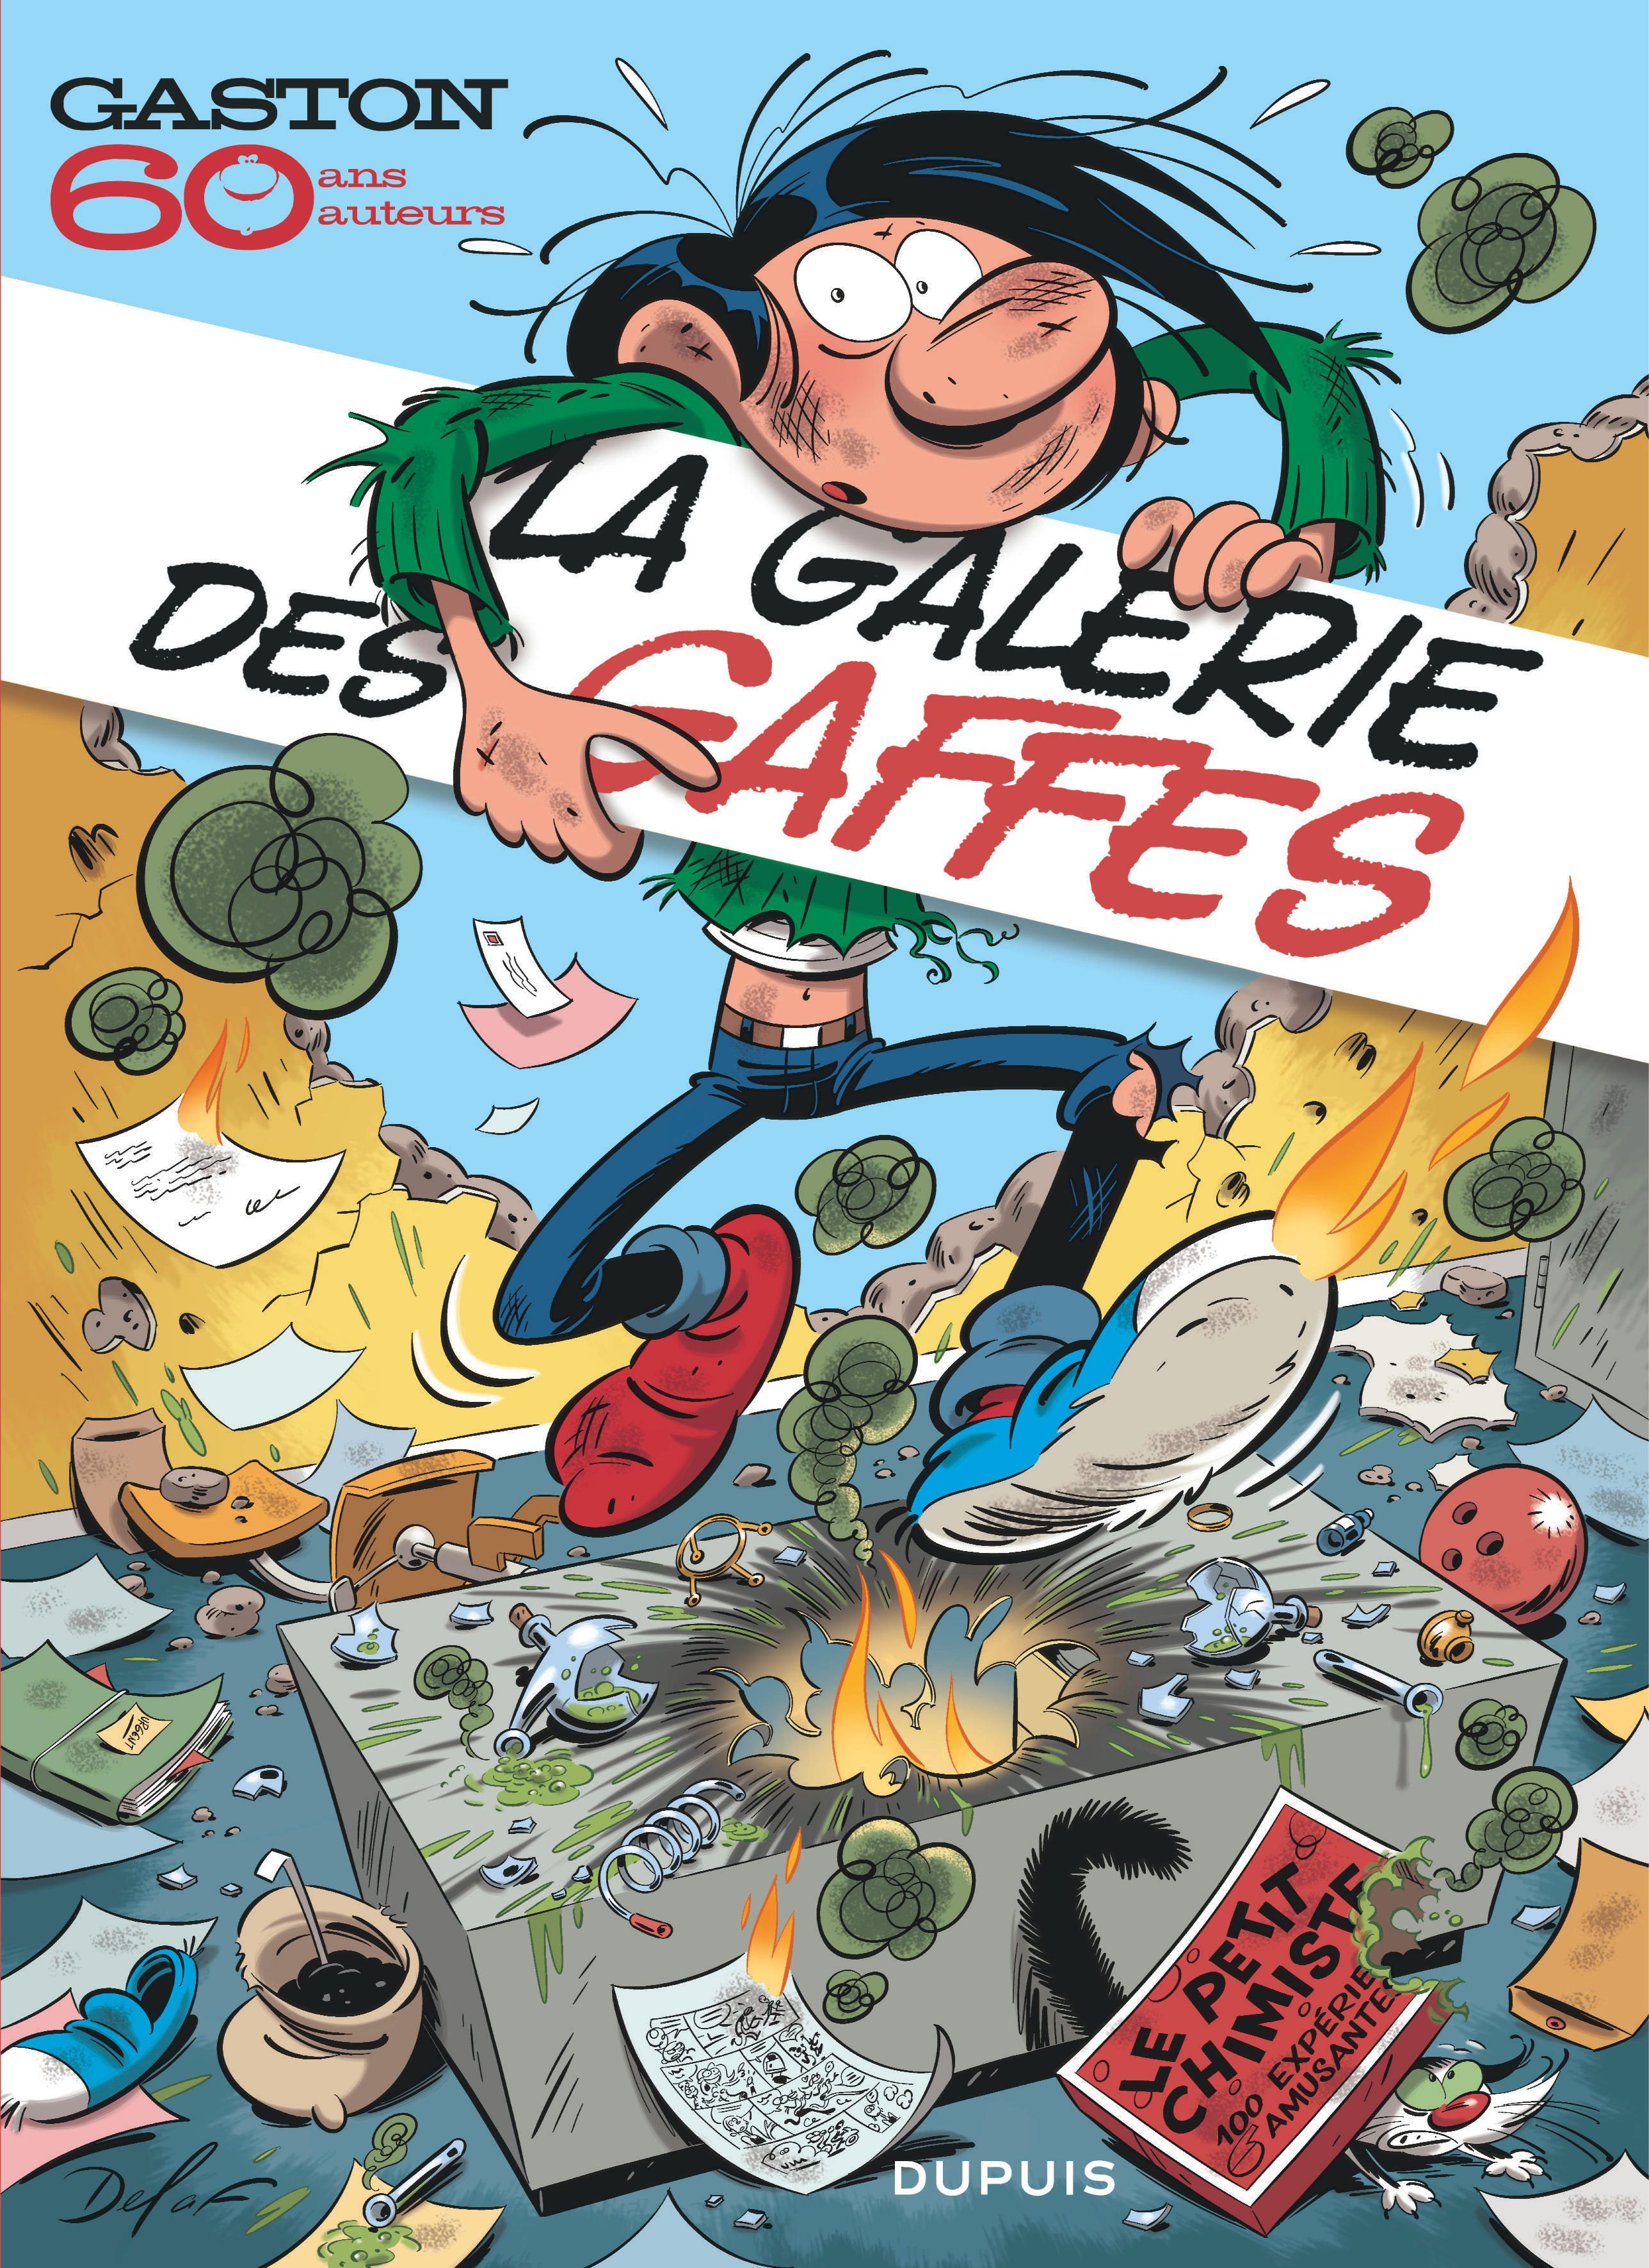 GASTON GALERIE DES GAFFES GASTON - LA GALERIE DES GAFFES - TOME 0 - GALERIE DES GAFFES